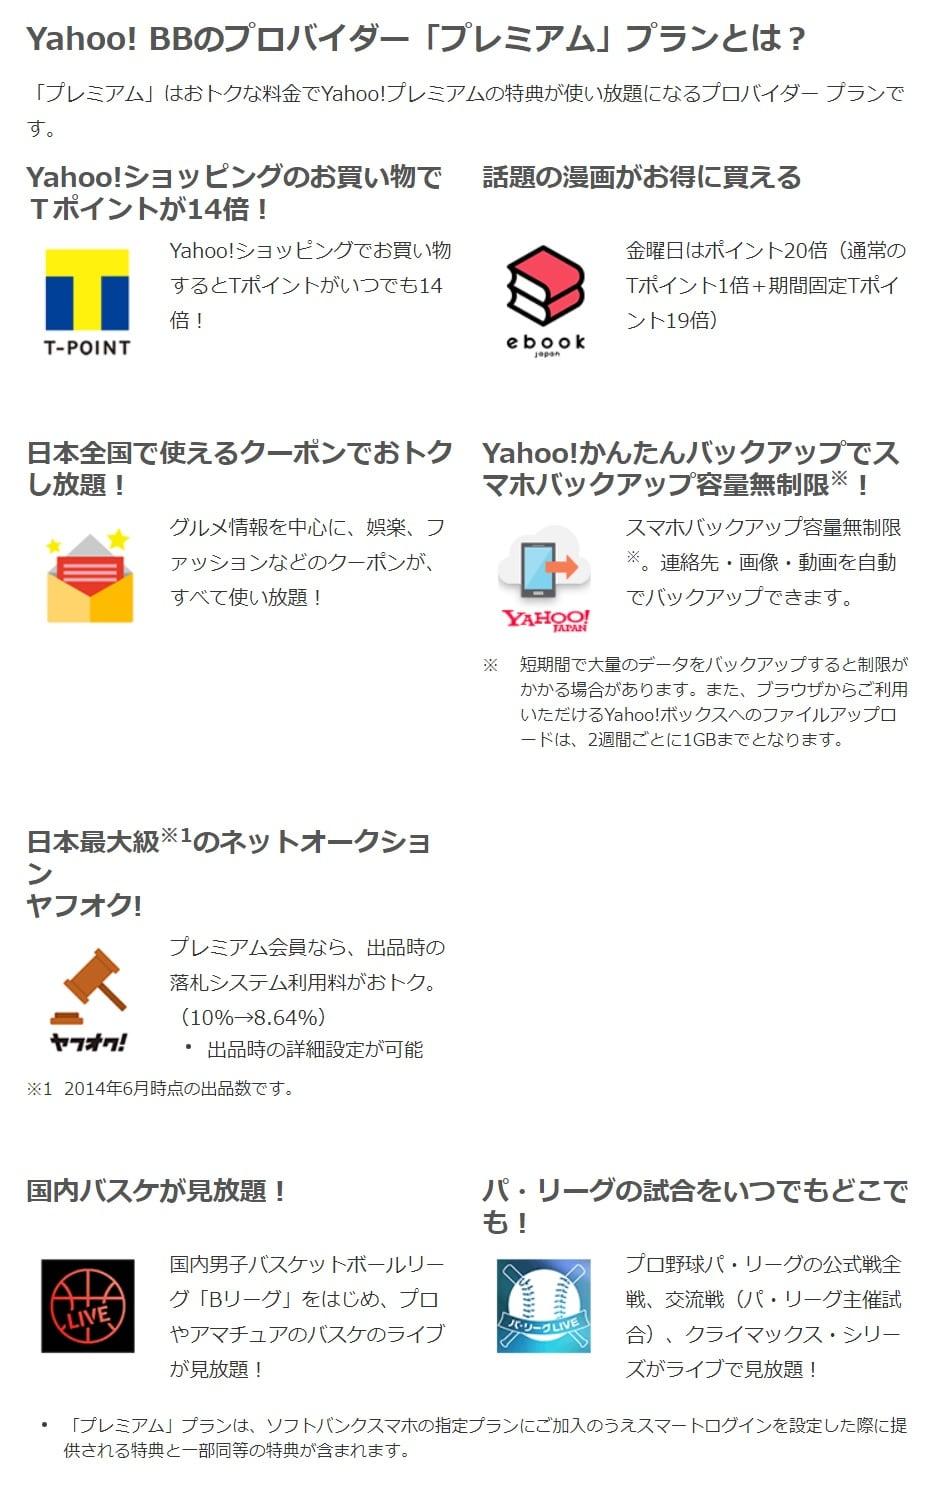 Yahoo!プレミアム内容